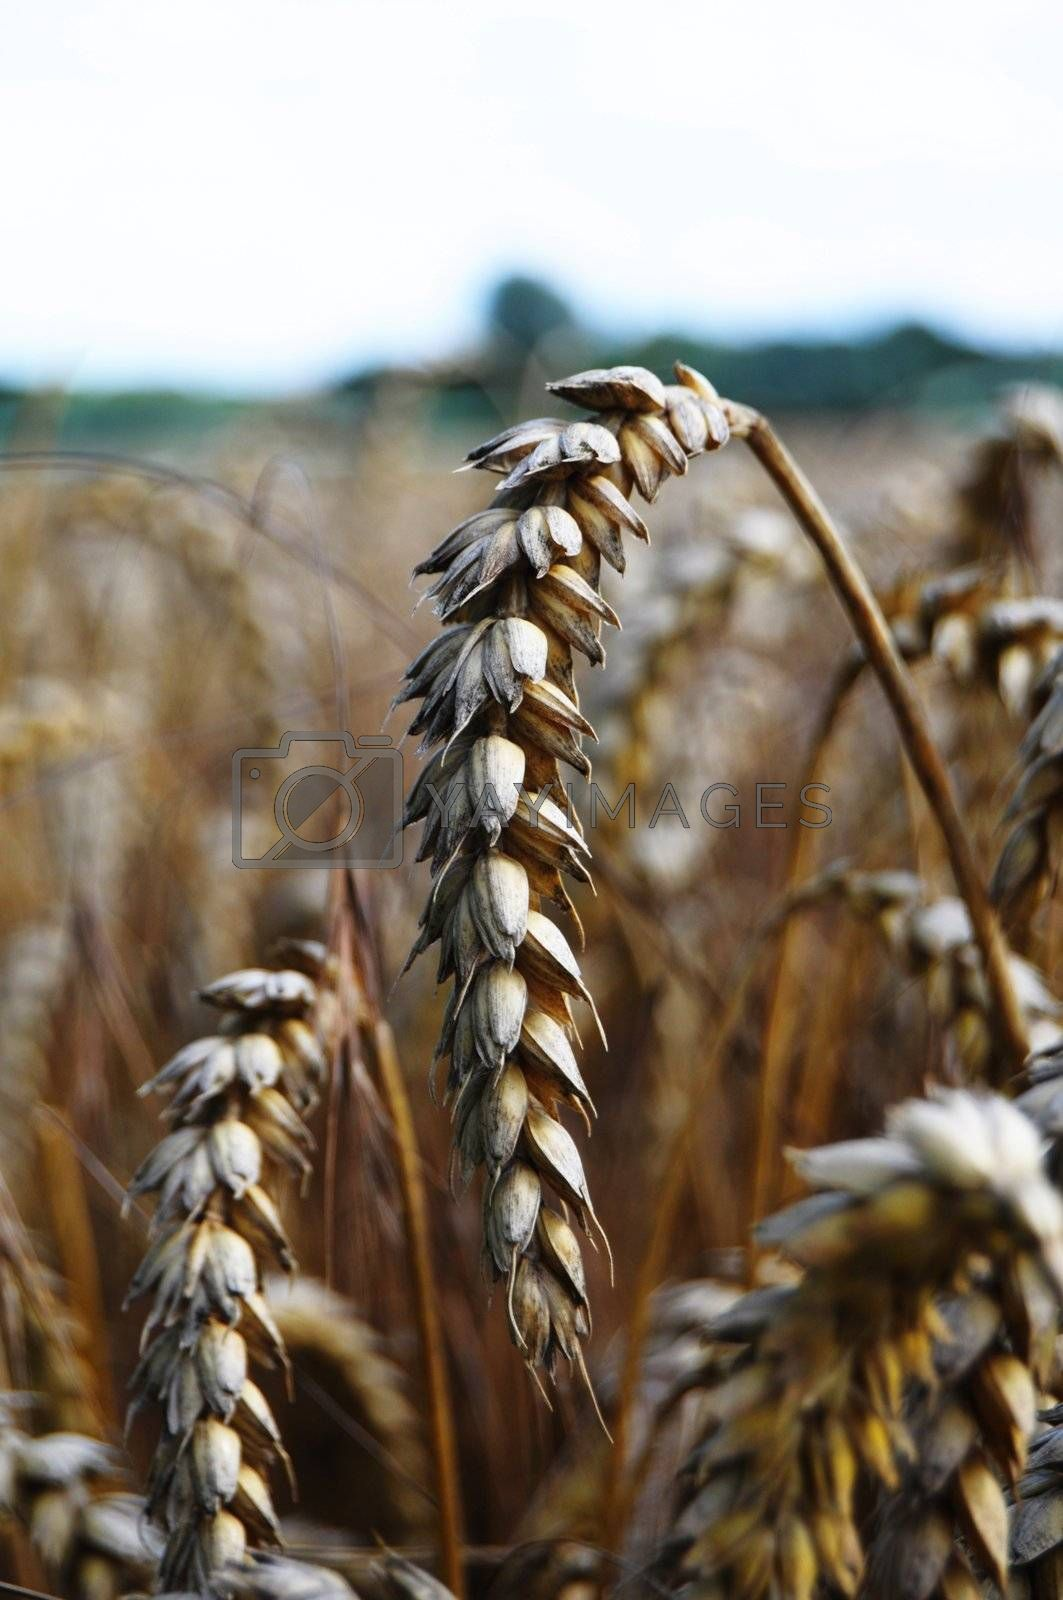 Royalty free image of wheat grain by gunnar3000